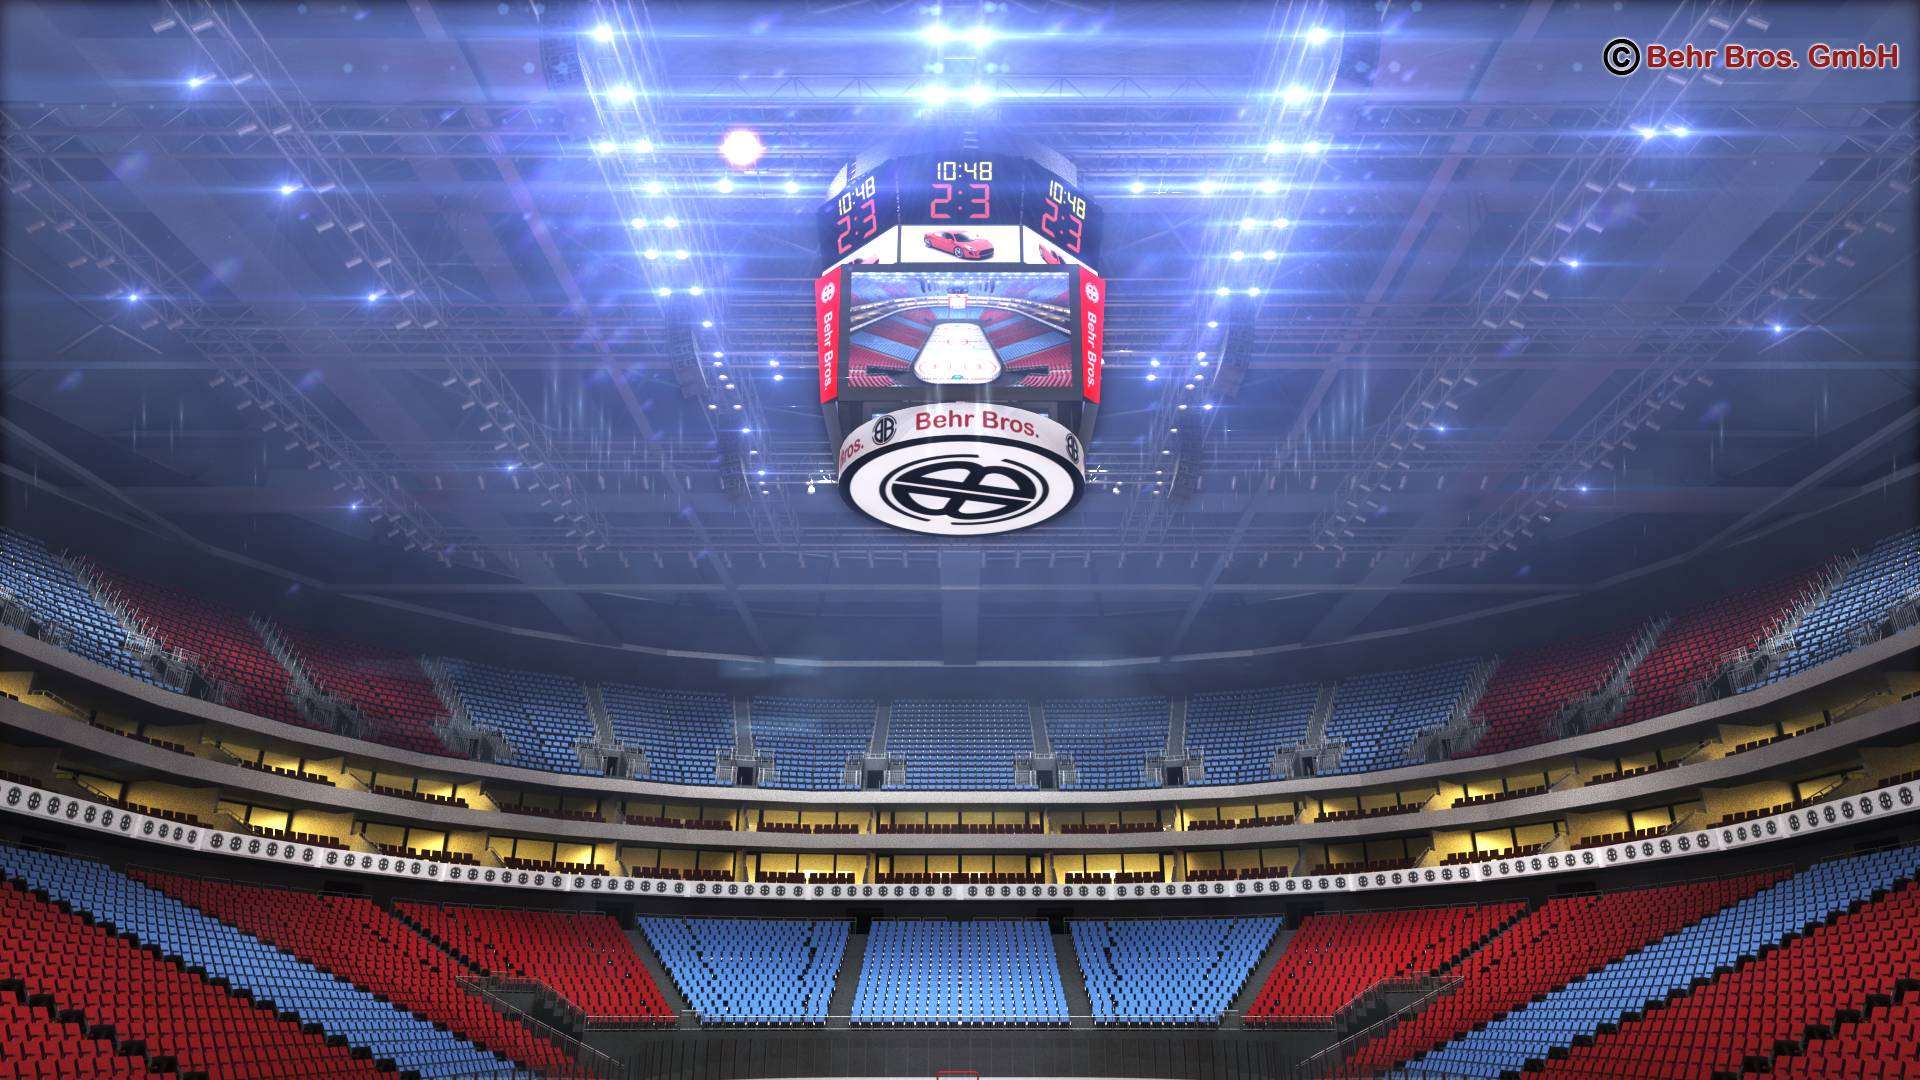 ice hockey arena v2 3d model 3ds max fbx c4d lwo ma mb obj 251659